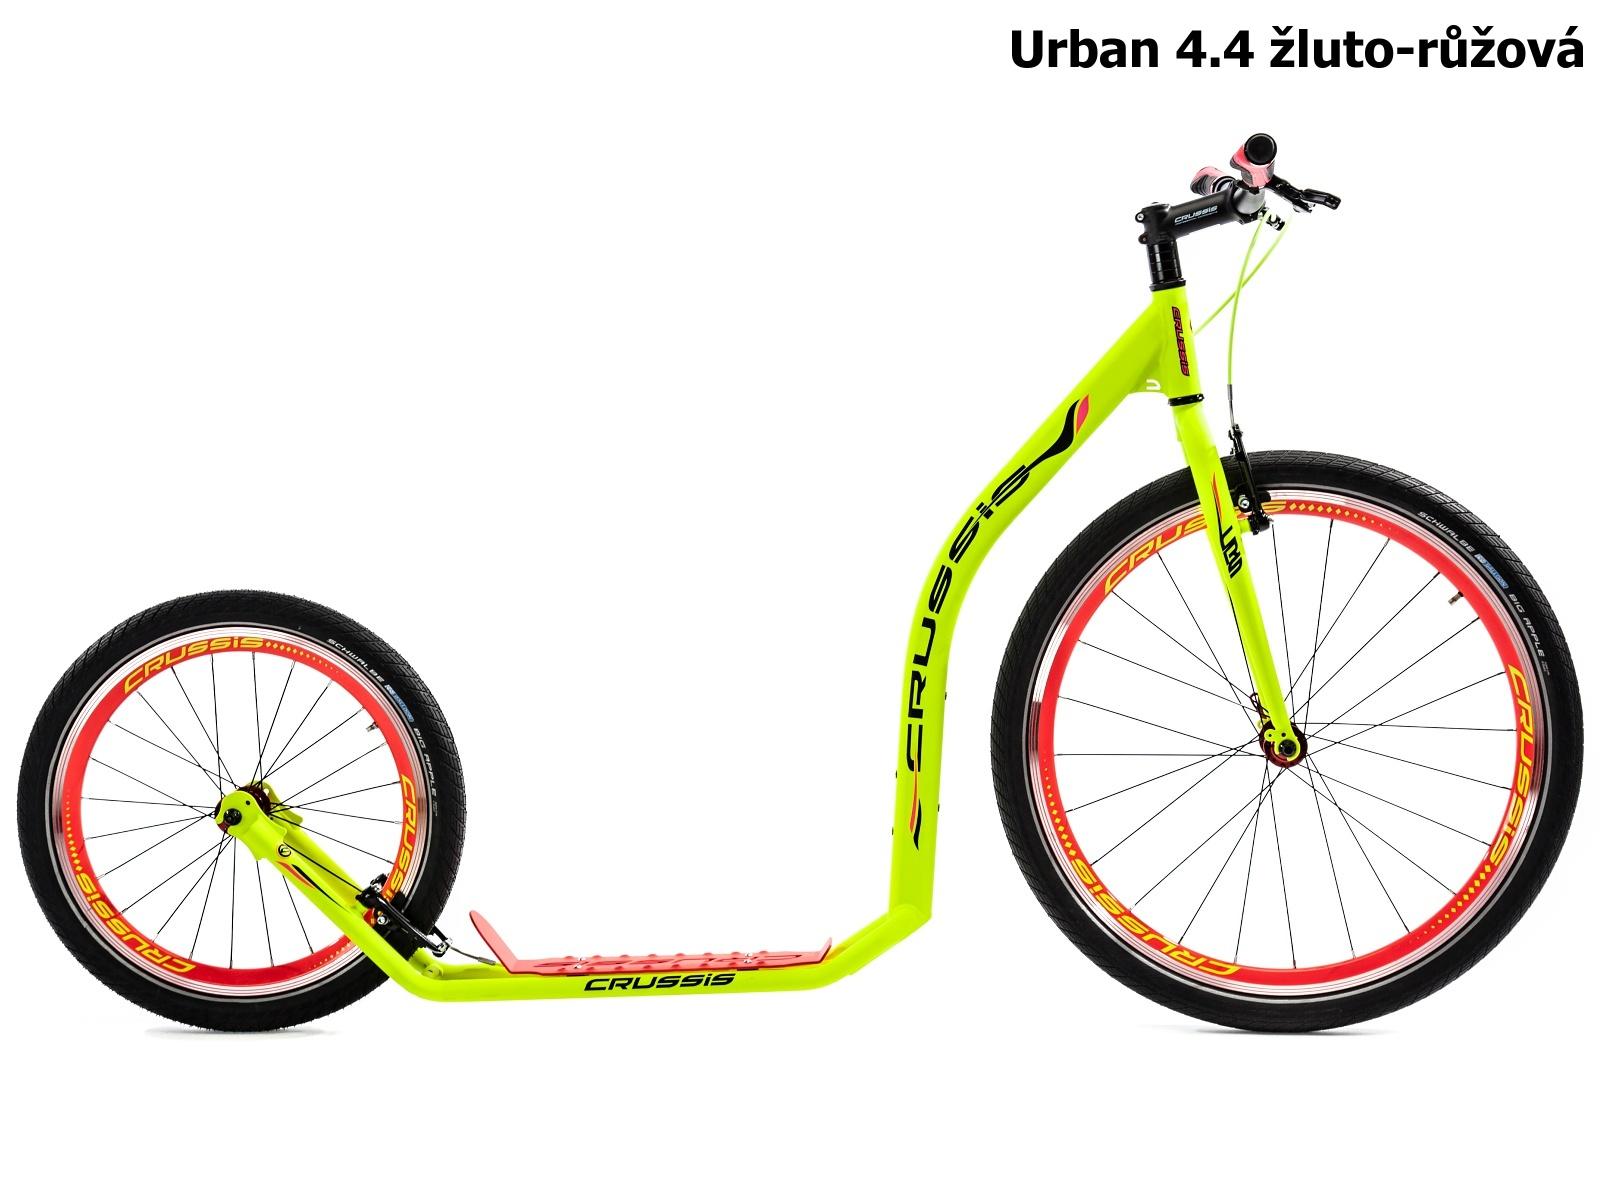 Crussis Urban 4.4